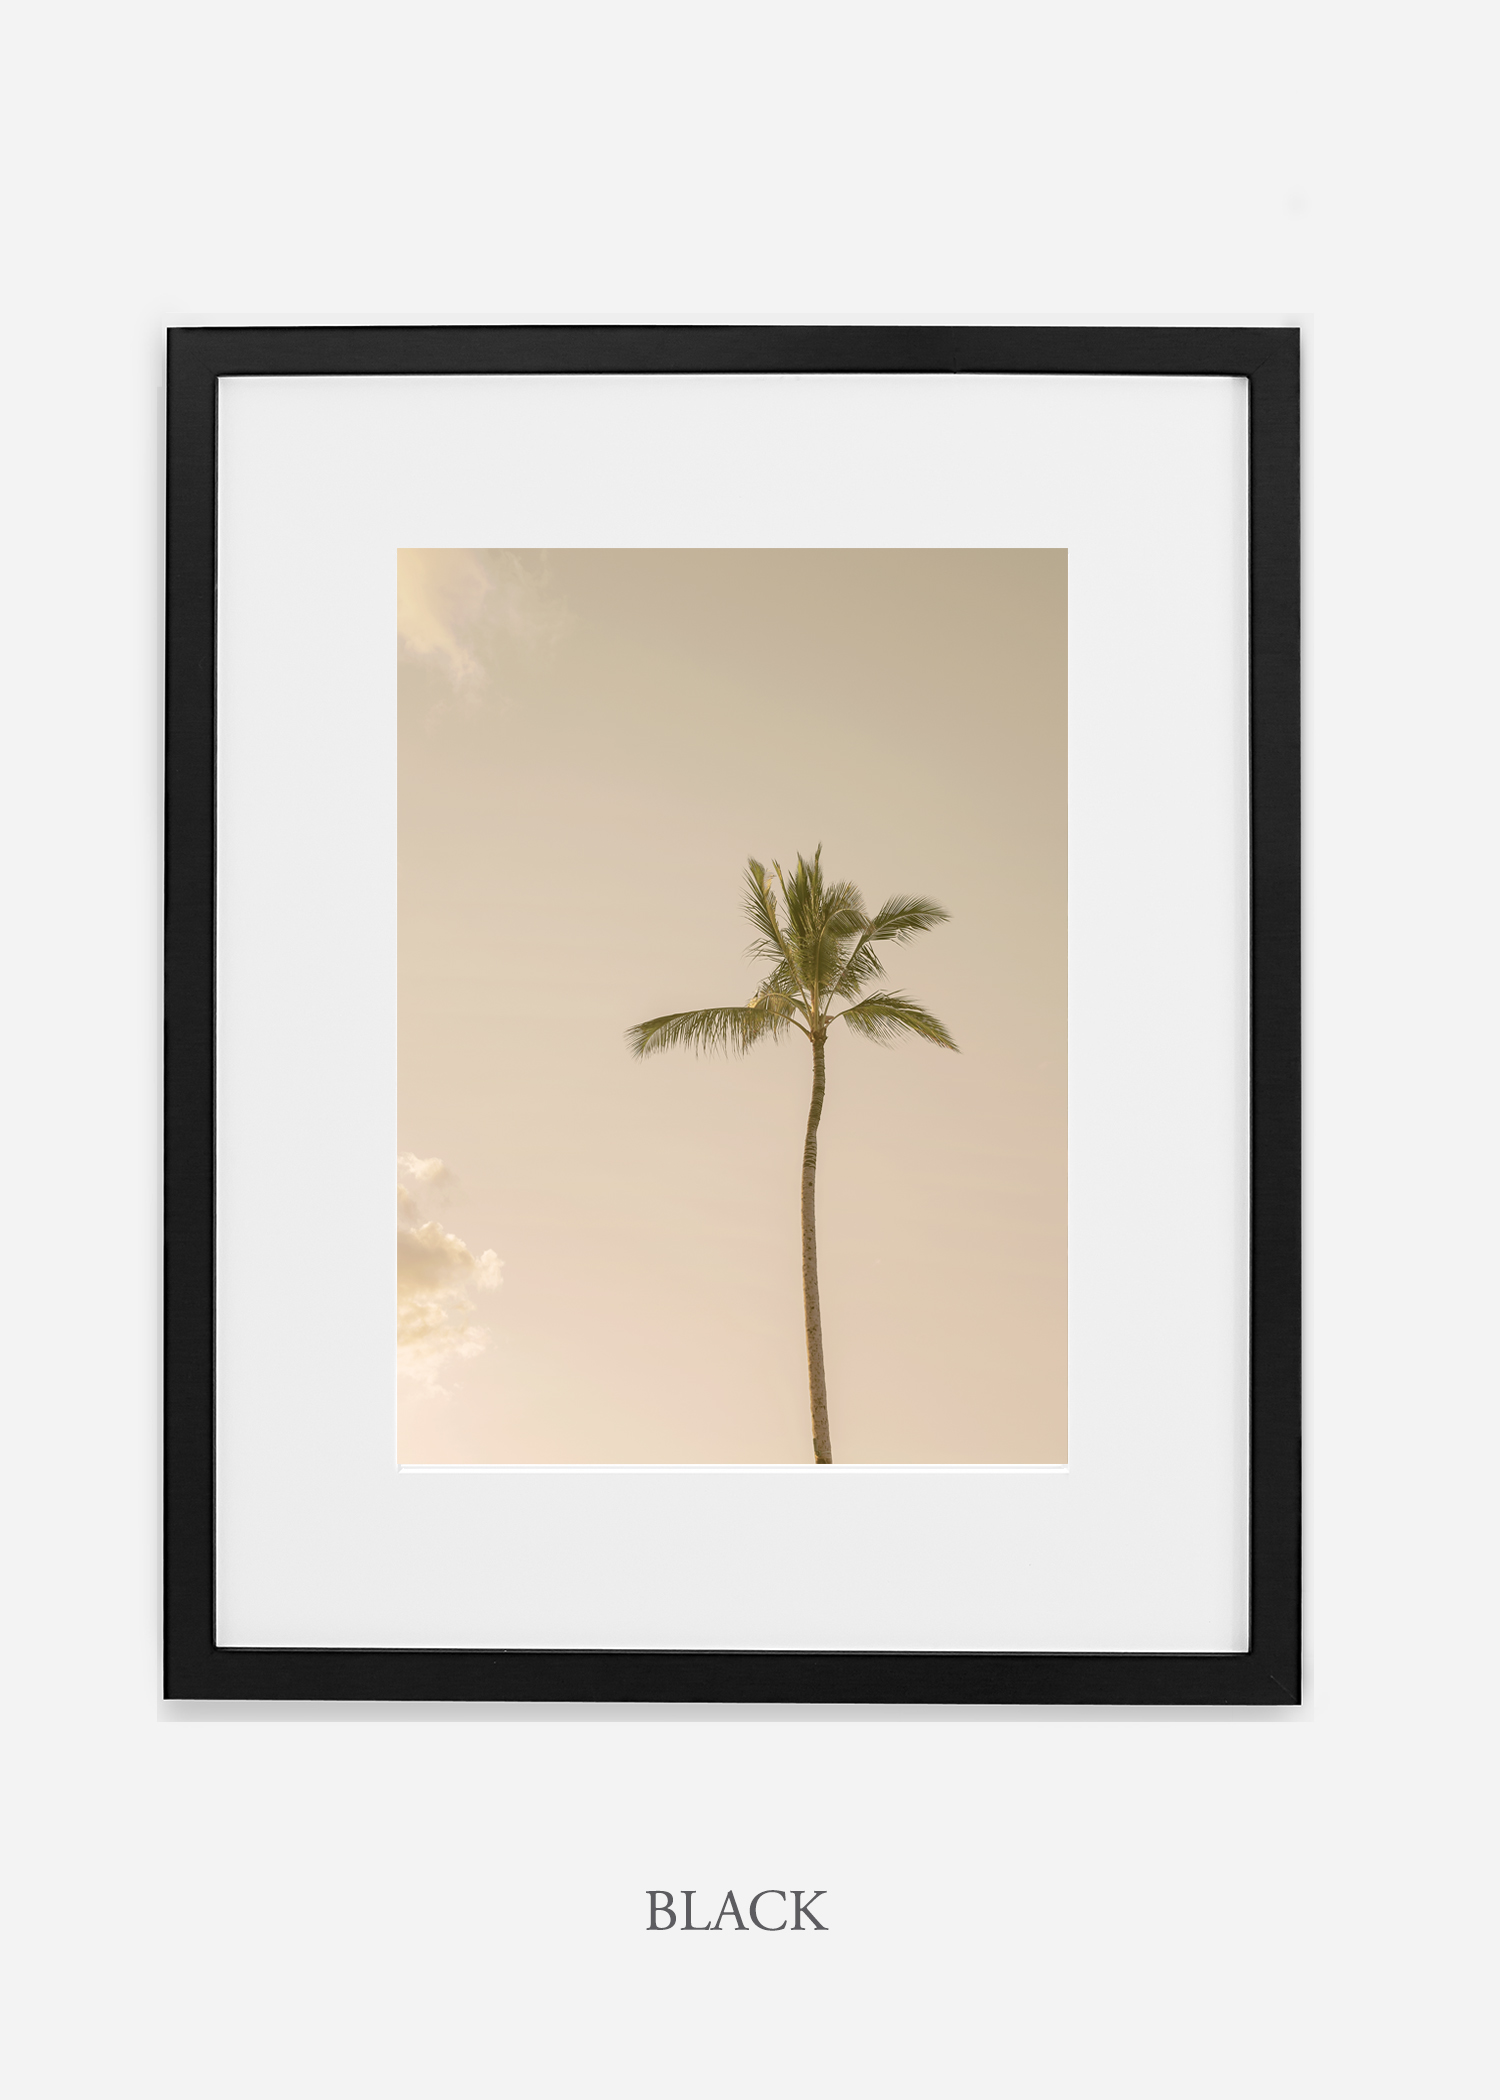 WilderCalifornia_Hawaii_lonepalm_tropicalart_blackframe.jpg